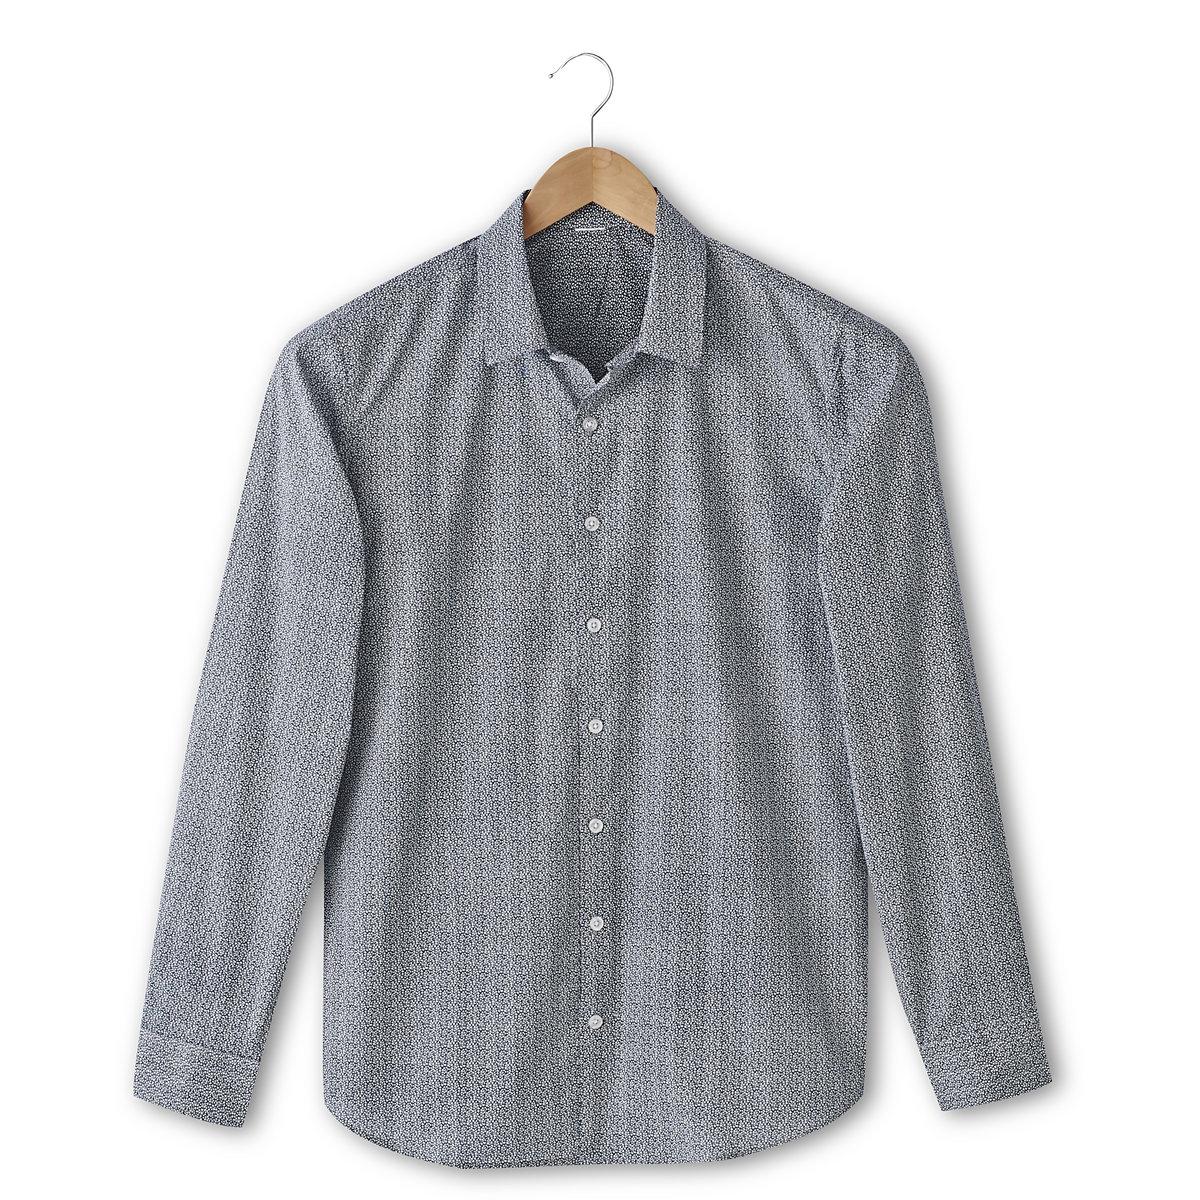 Рубашка с рисунком облегающего покроя